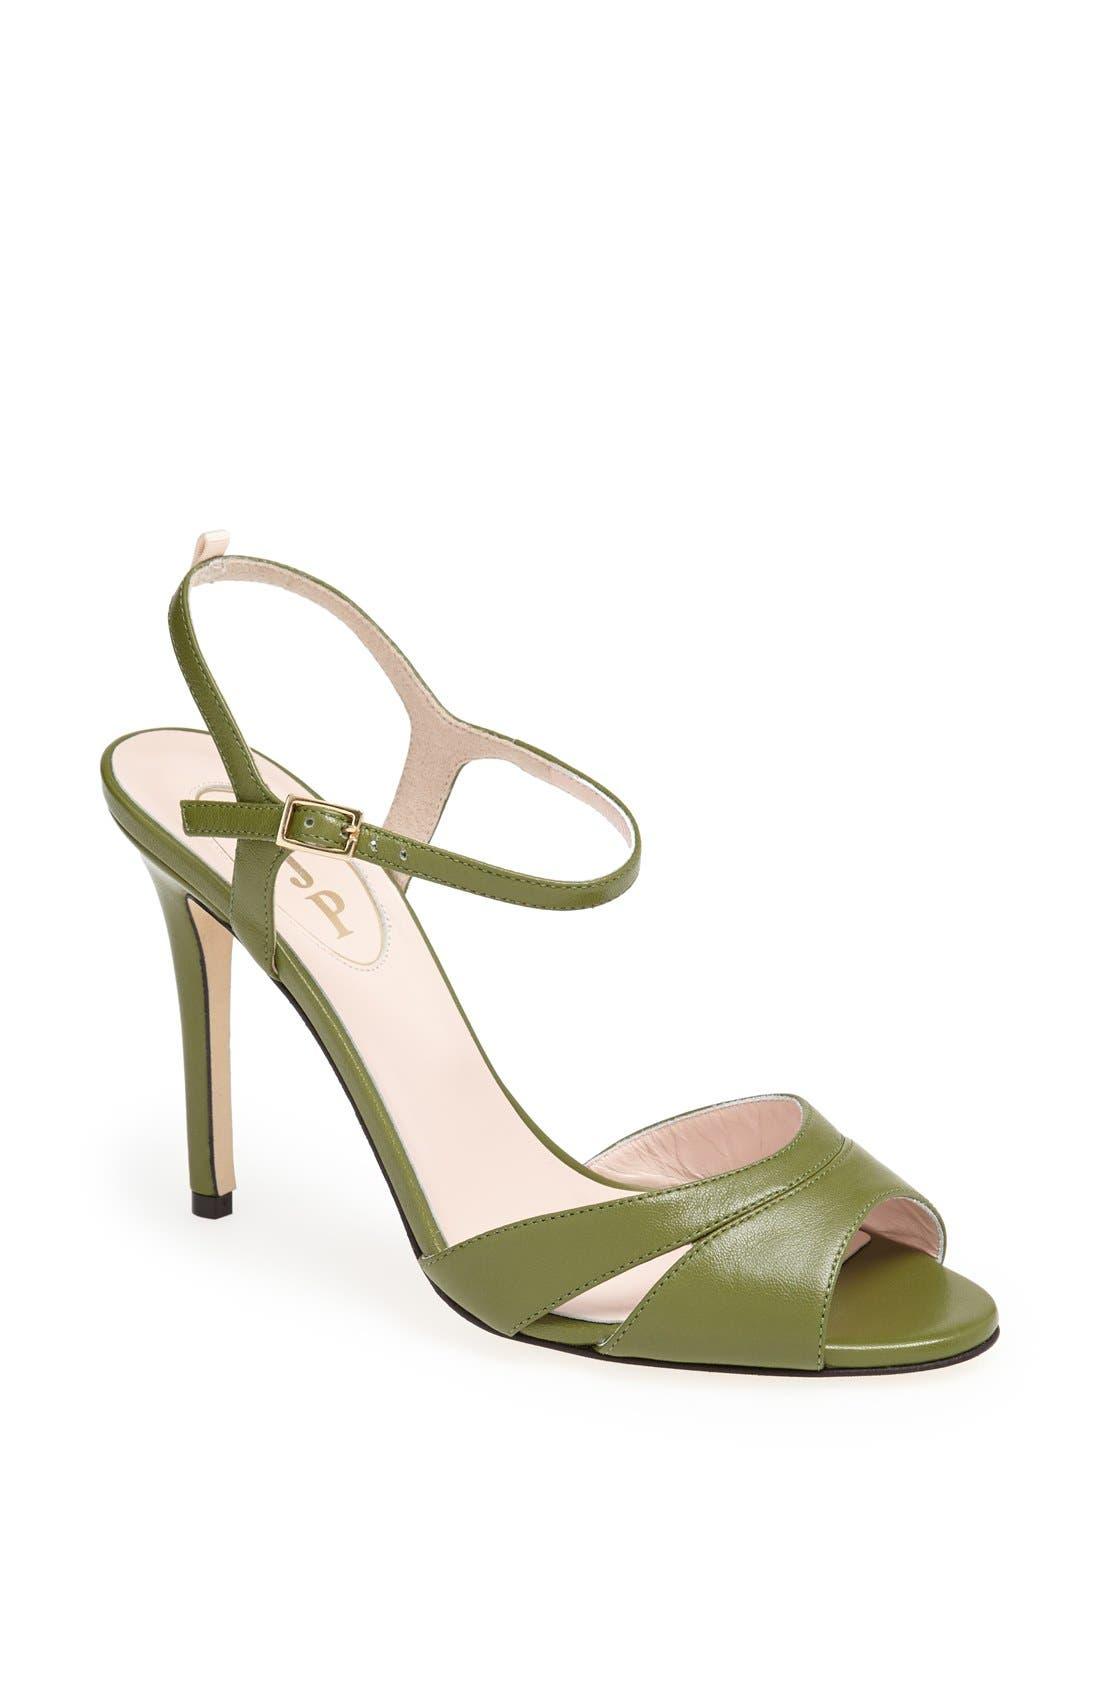 SJP 'Anna' Sandal,                         Main,                         color, Green